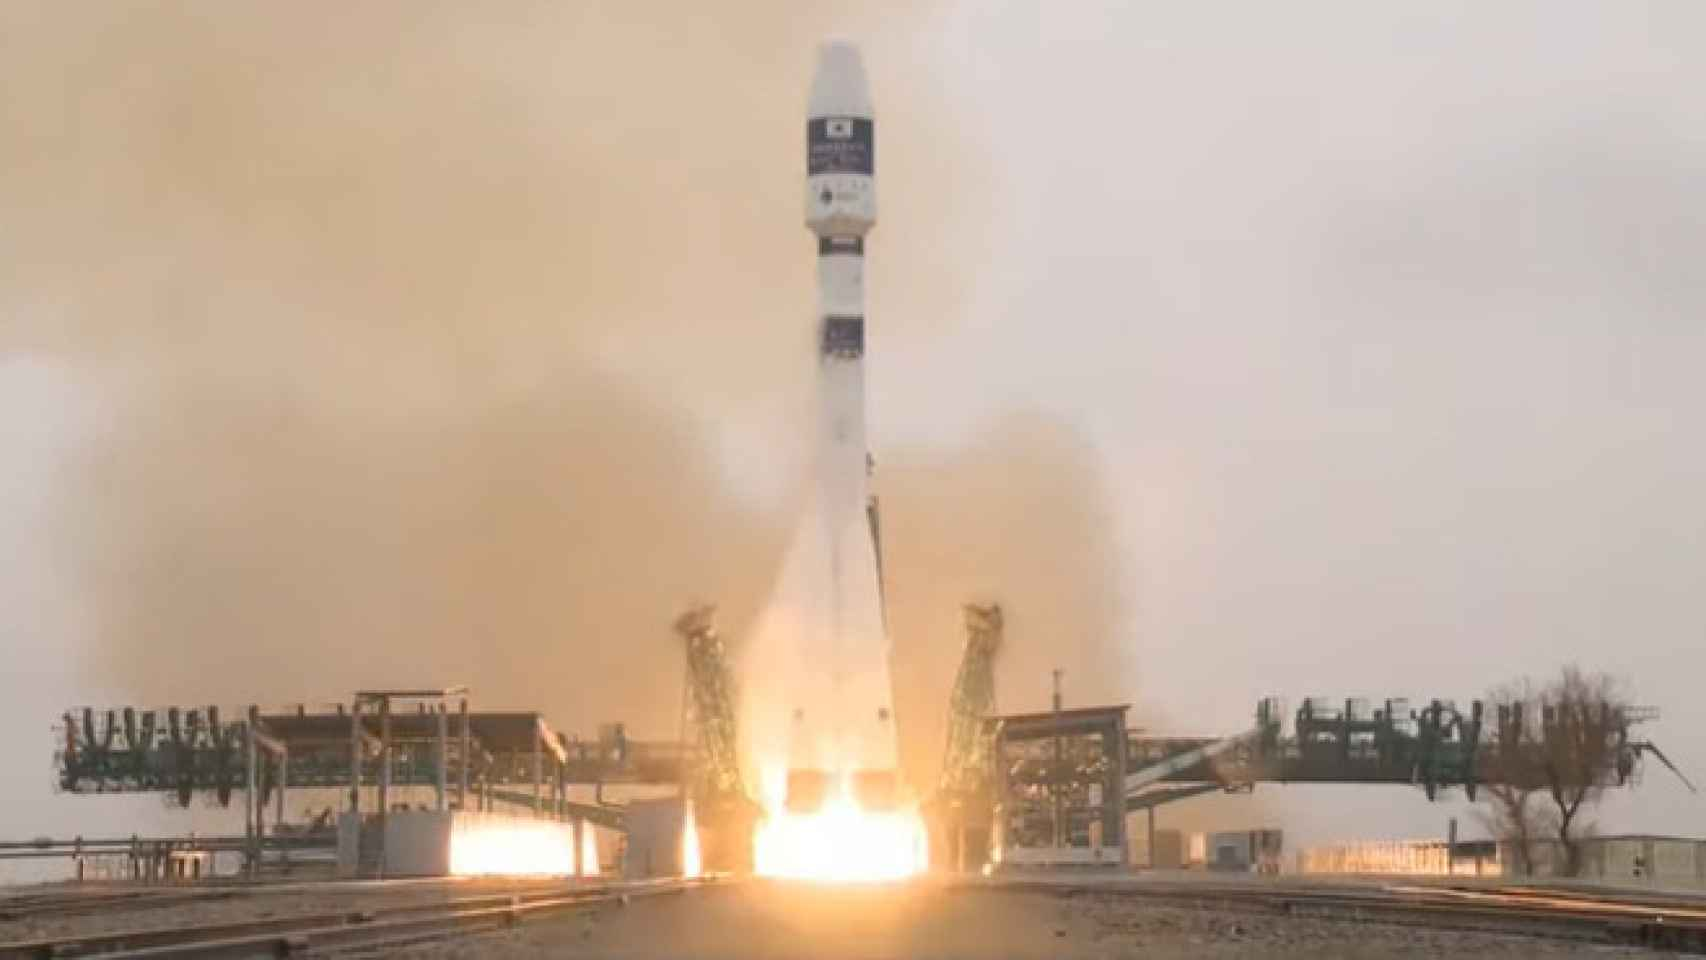 Cohete despegando